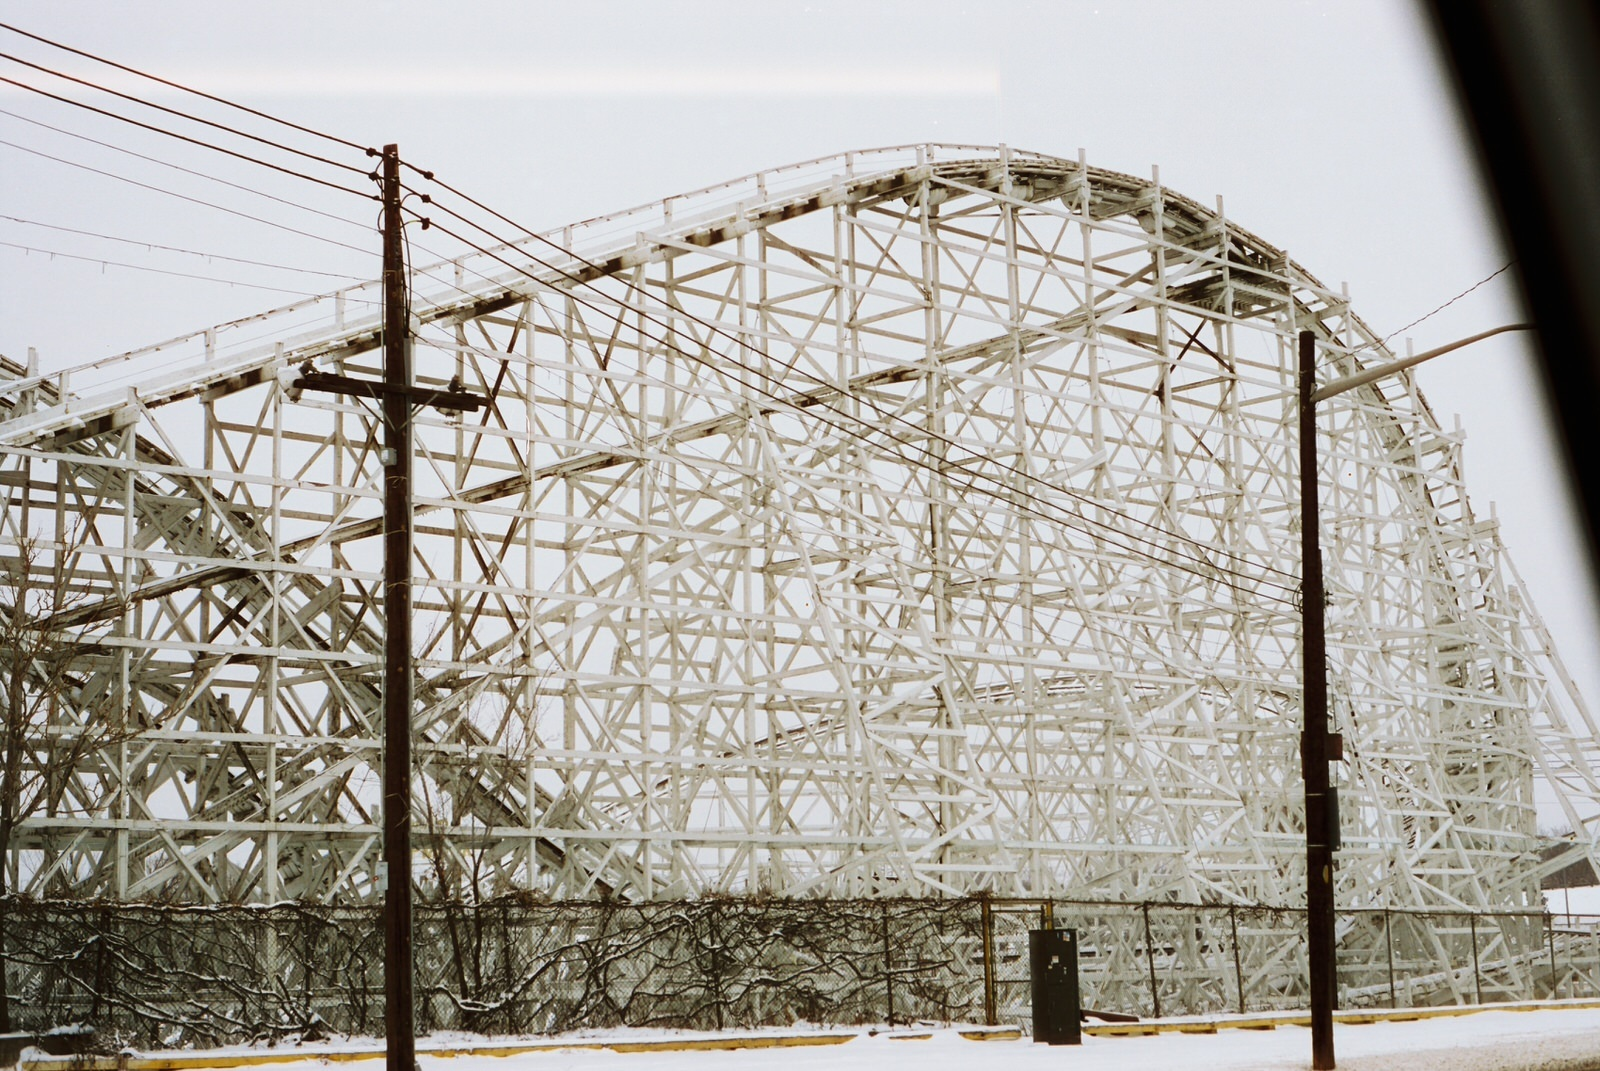 Lakeside Roller Coaster